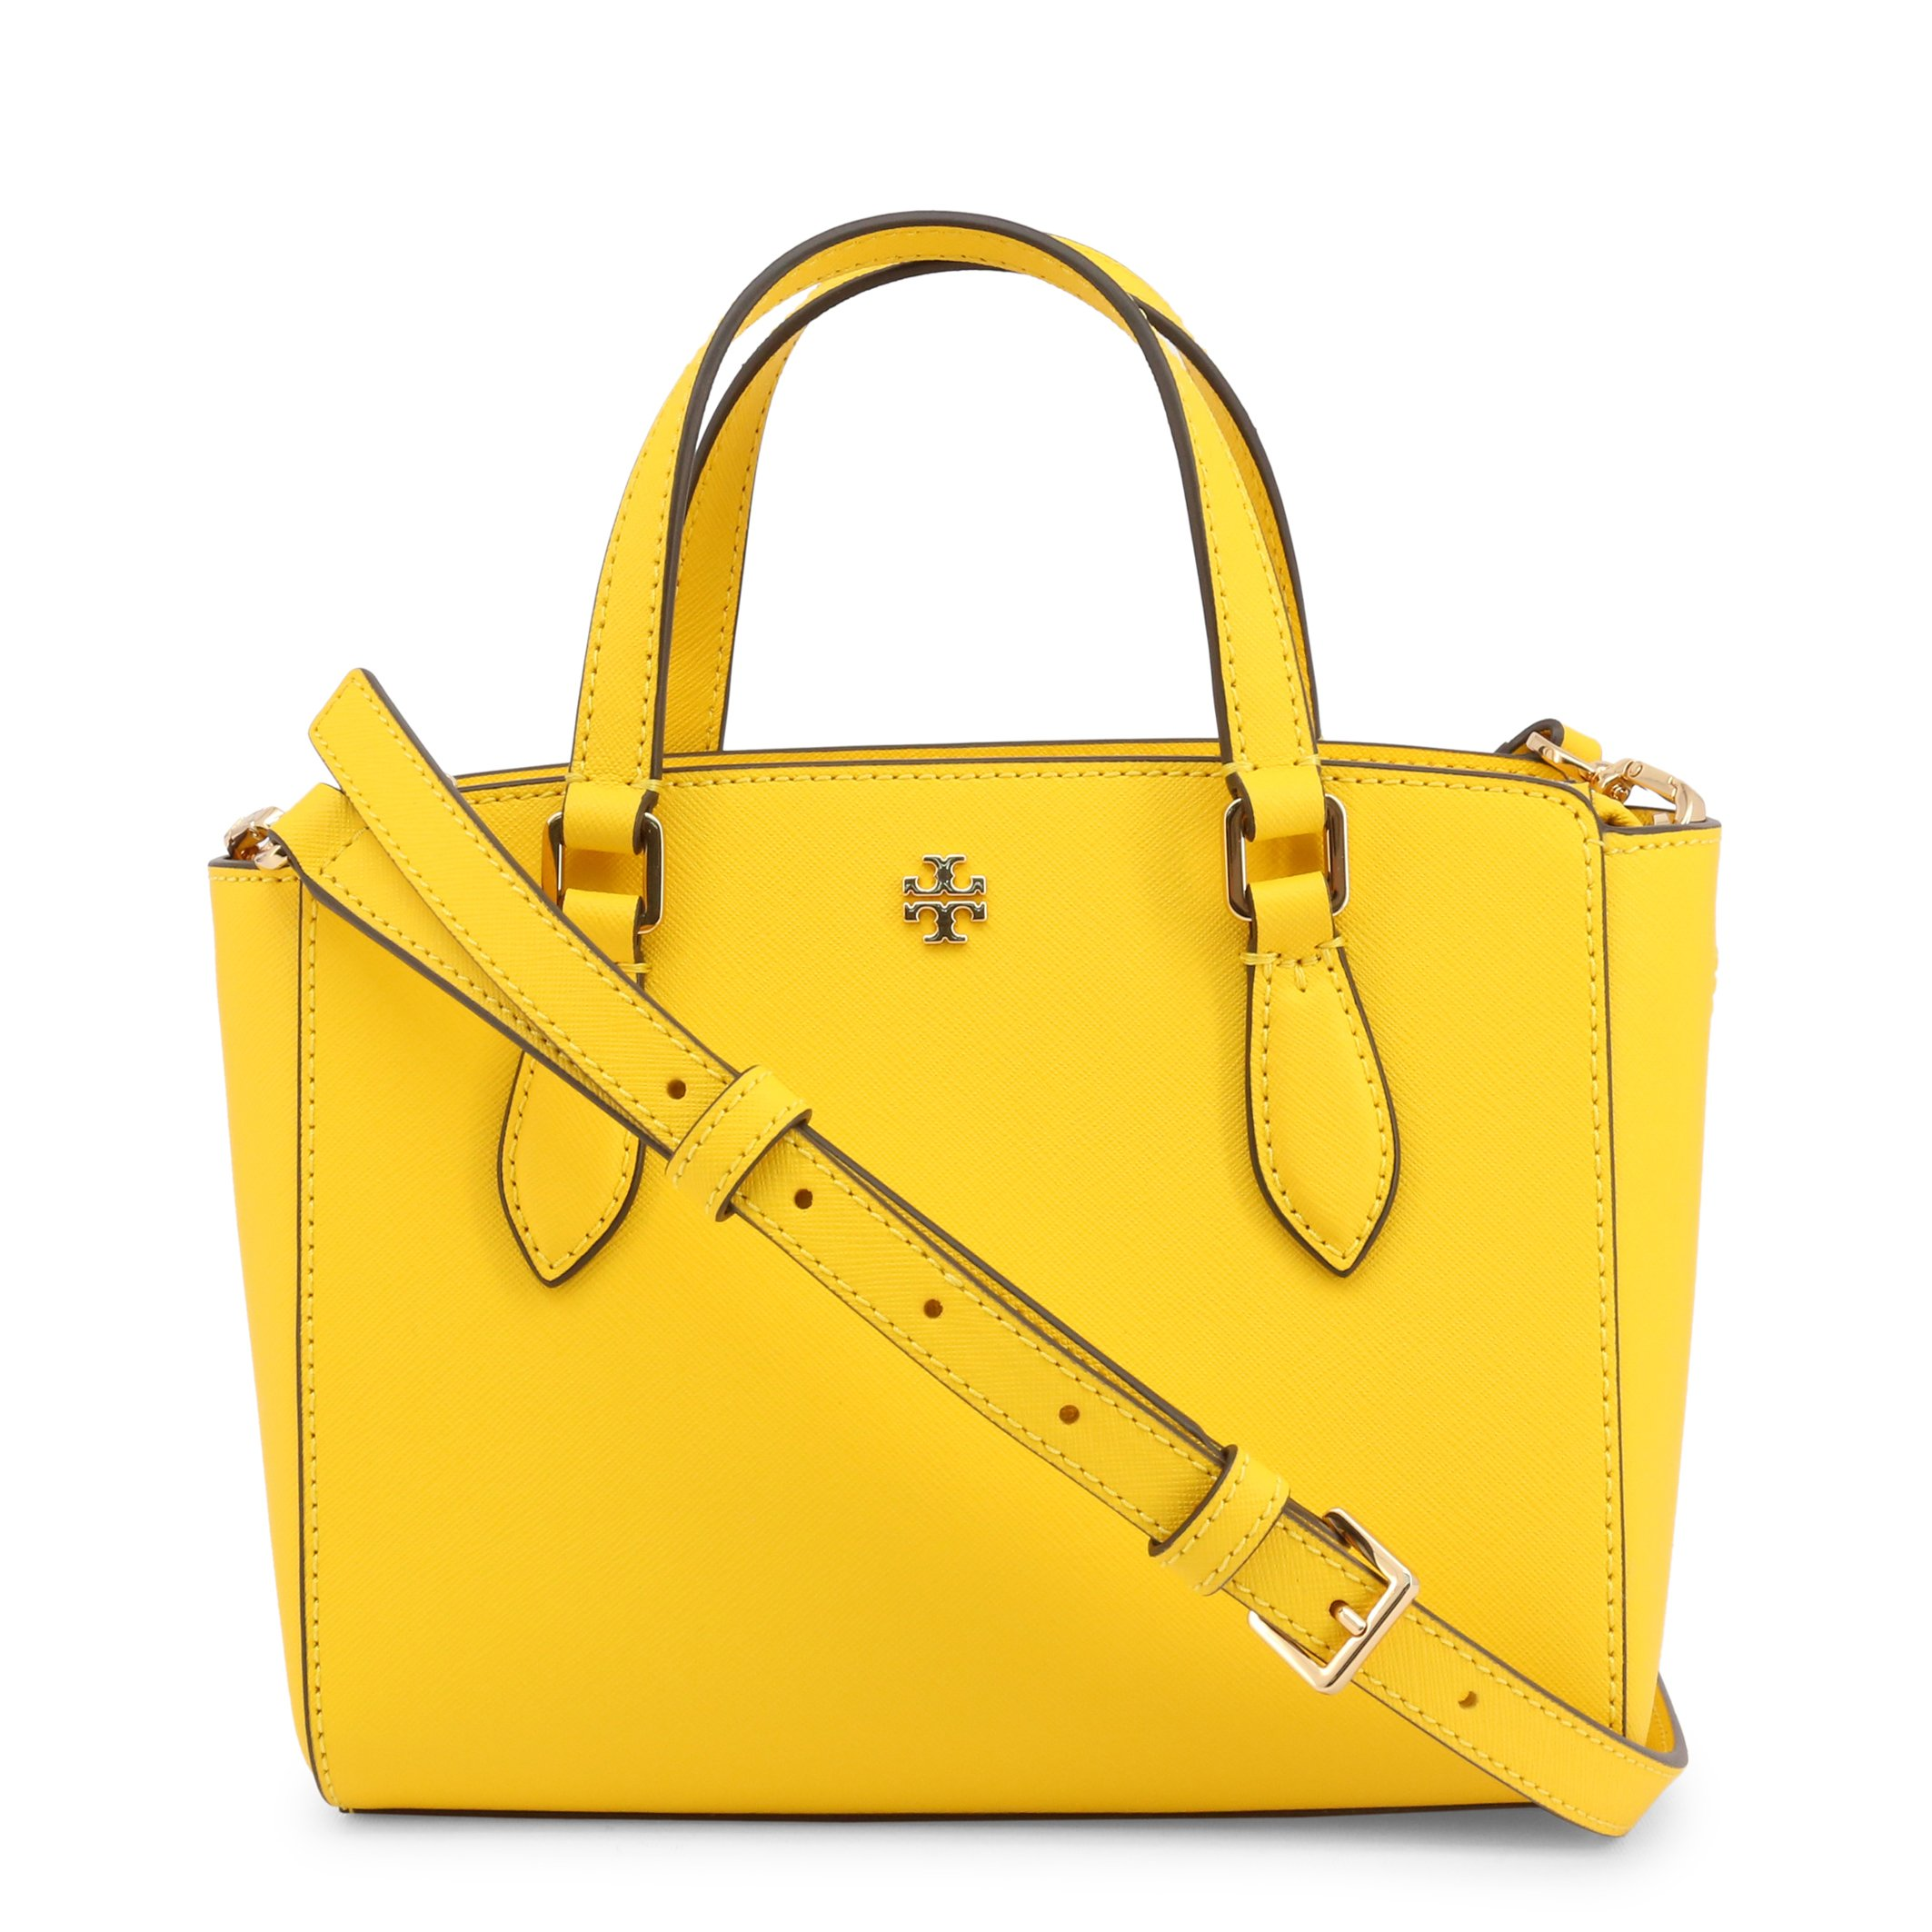 Tory Burch Women's Handbag Various Colours 64189 - yellow NOSIZE